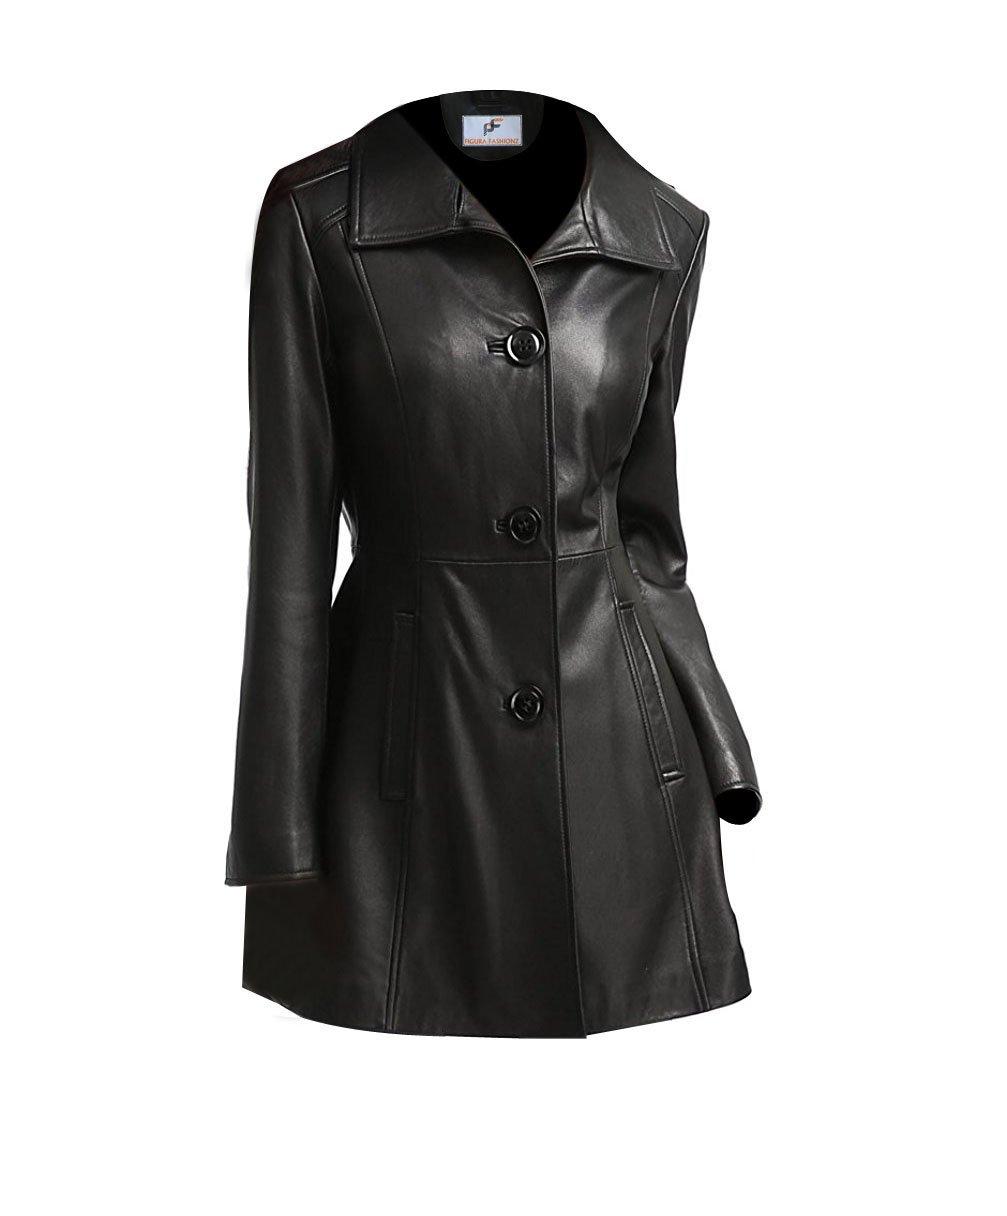 Figura Fashionz Faux Leather Long Body Coat for Women (X-Small)